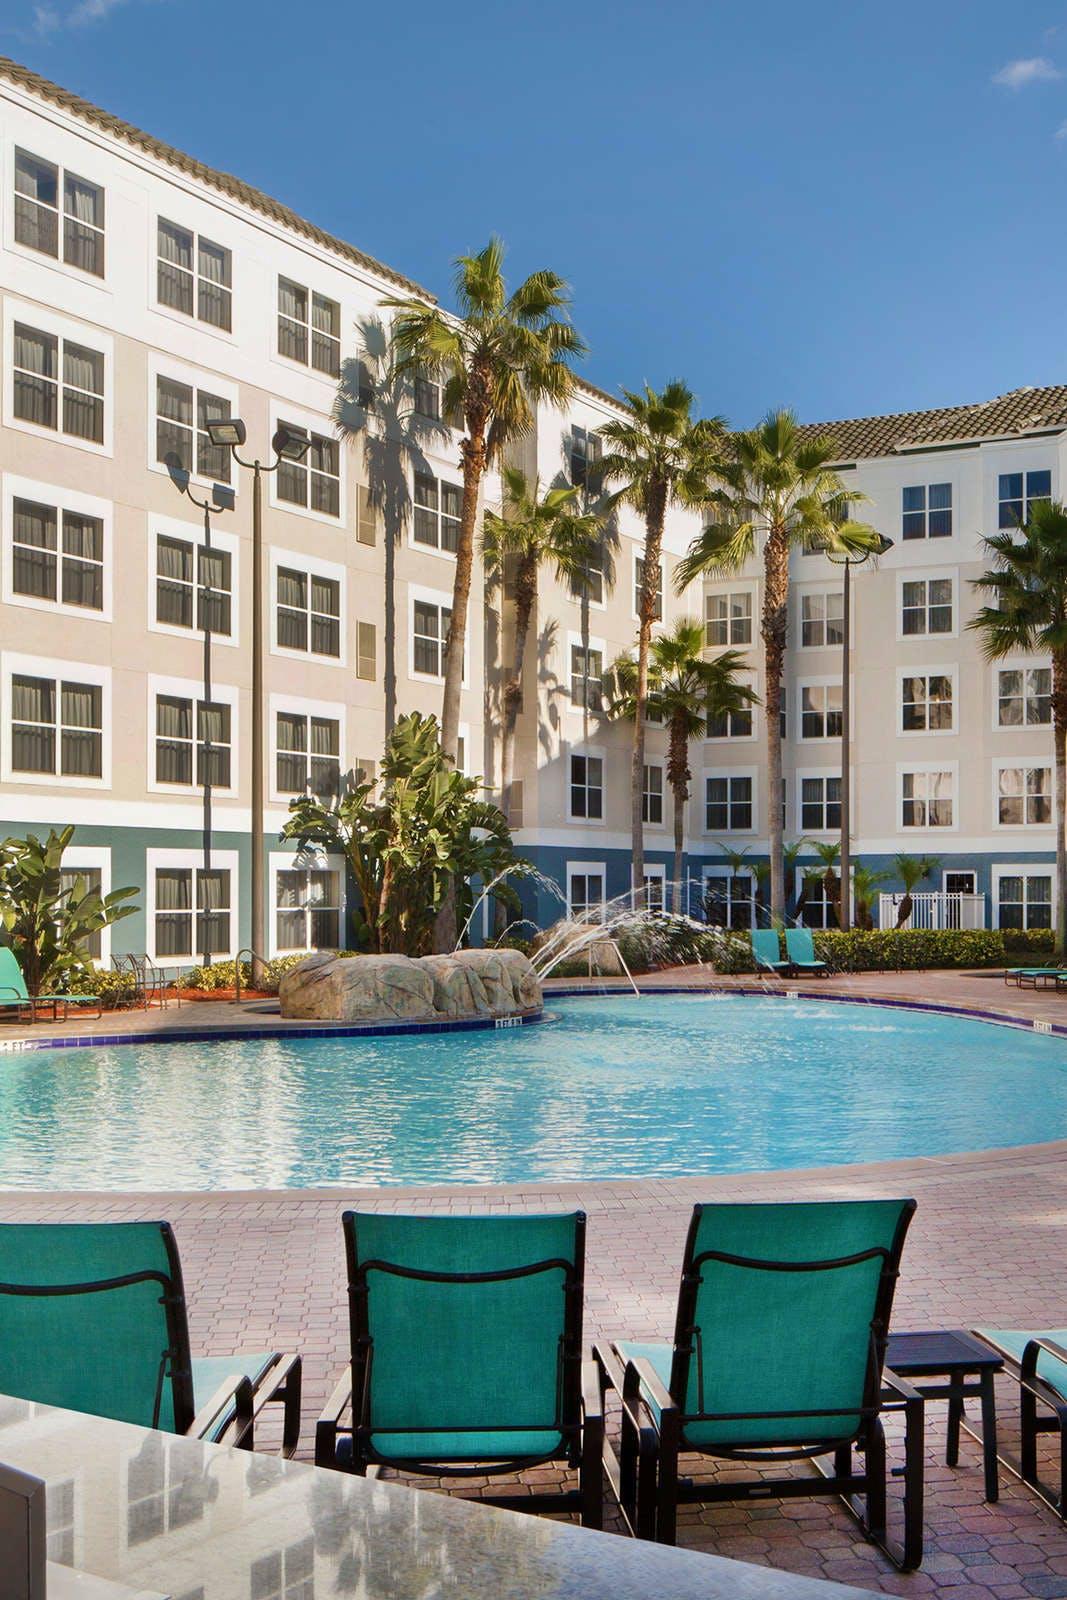 Residence Inn by Marriott Orlando Lake Buena Vista